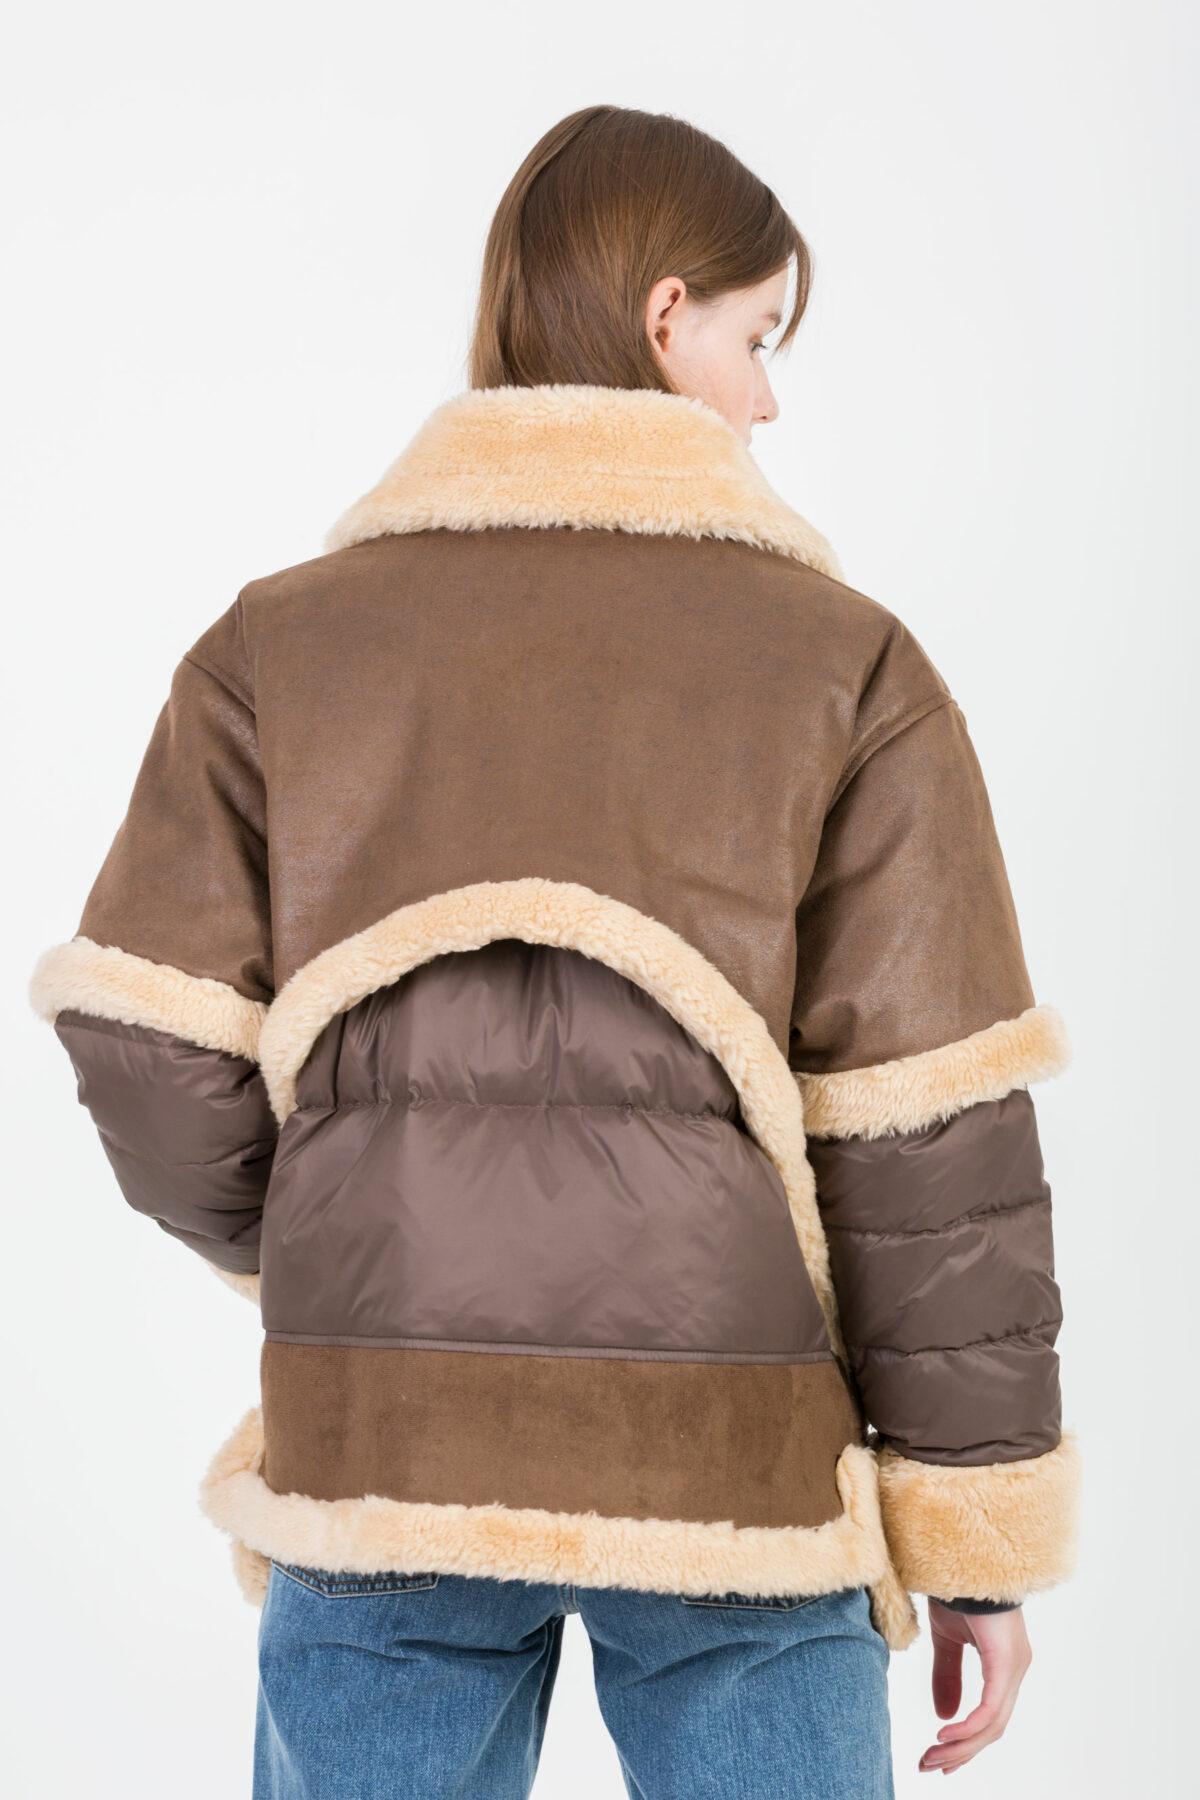 boombastic-jacket-brown-mesdemoiselles-fake-fur-matchboxathens